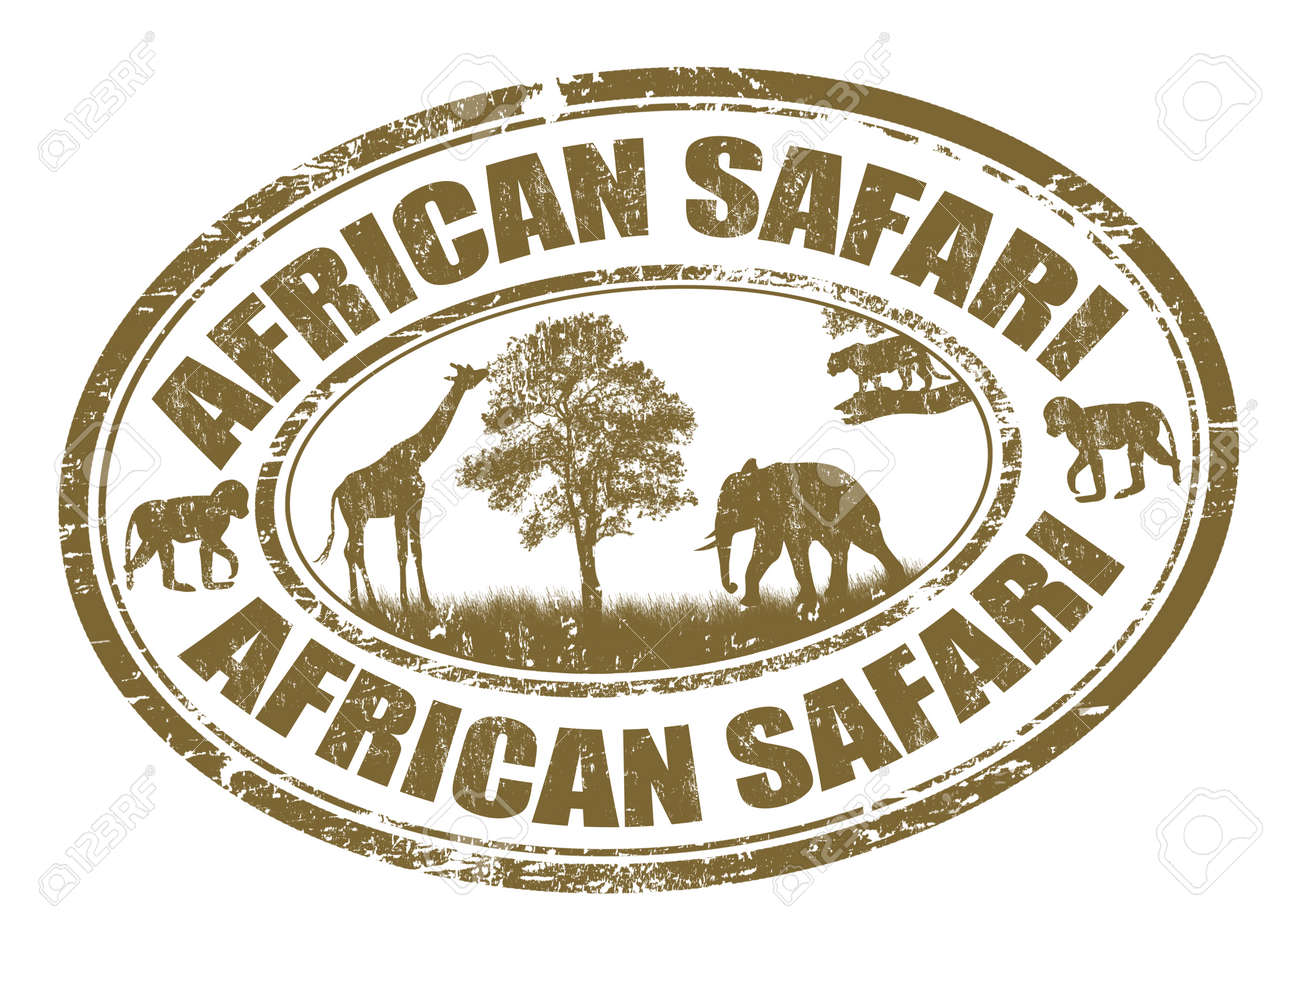 African safari grunge rubber stamp on white, vector illustration - 25402554